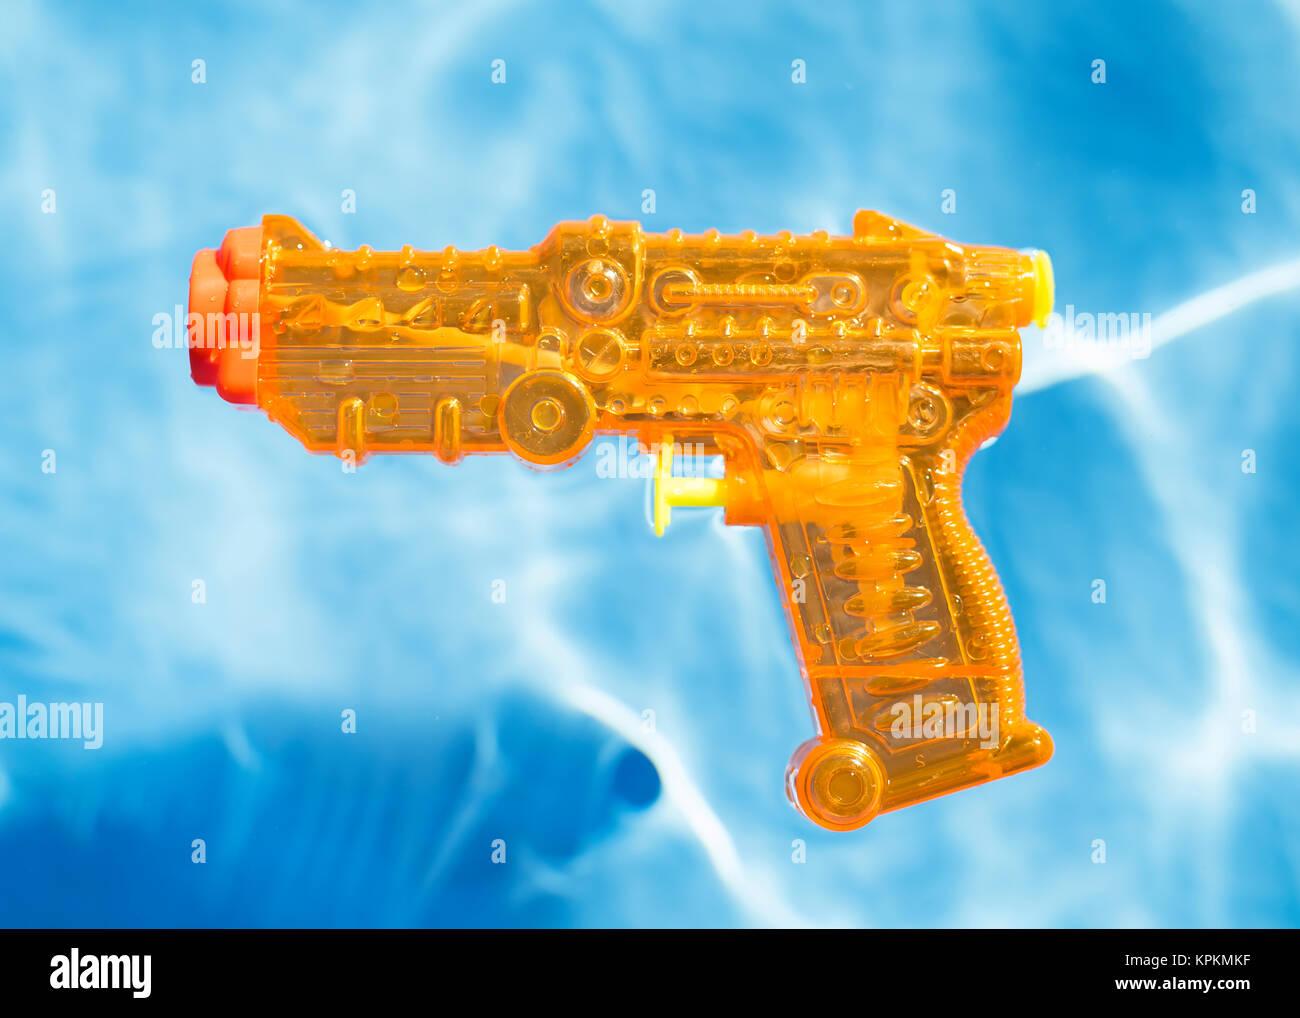 Orange squirt gun floating in water. - Stock Image